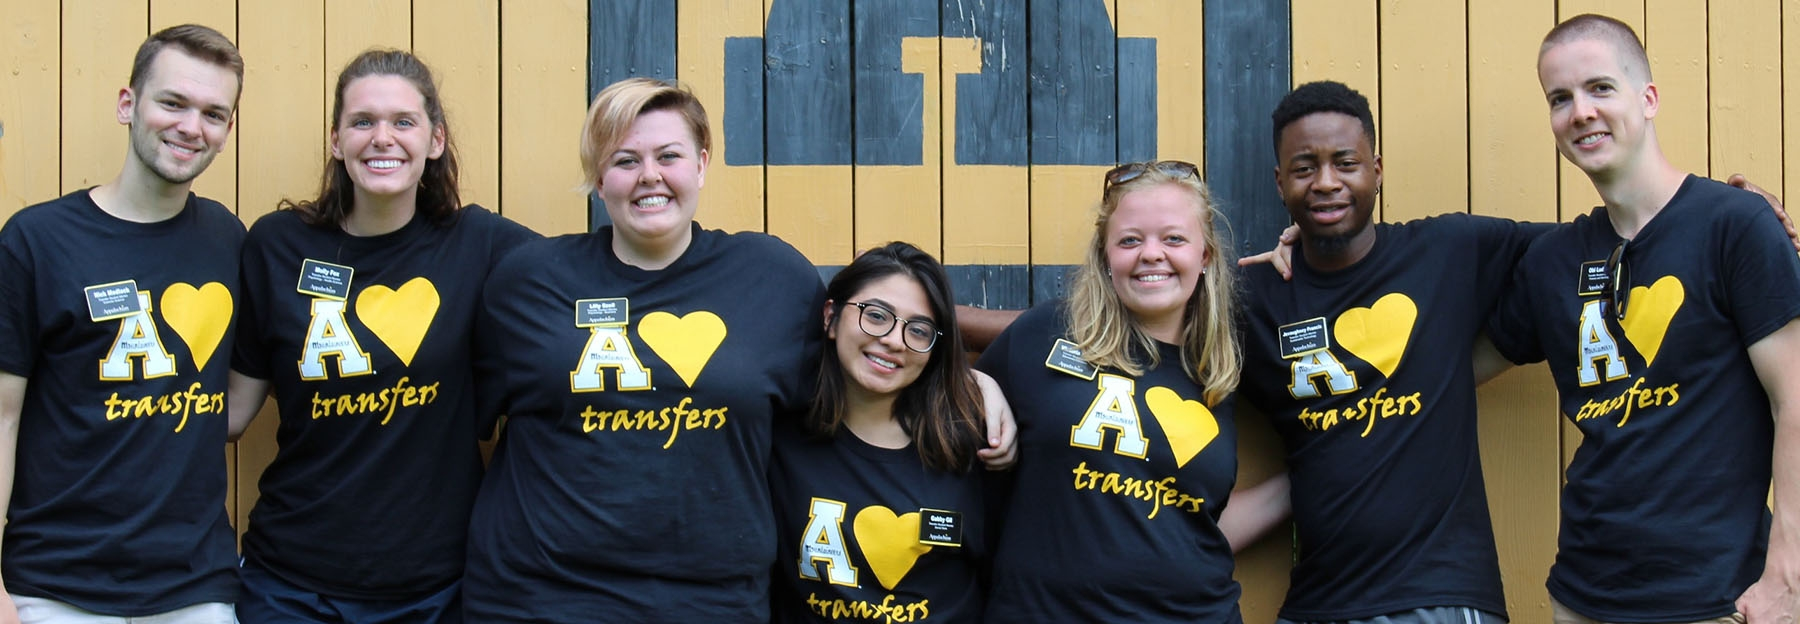 Appalachian transfer students